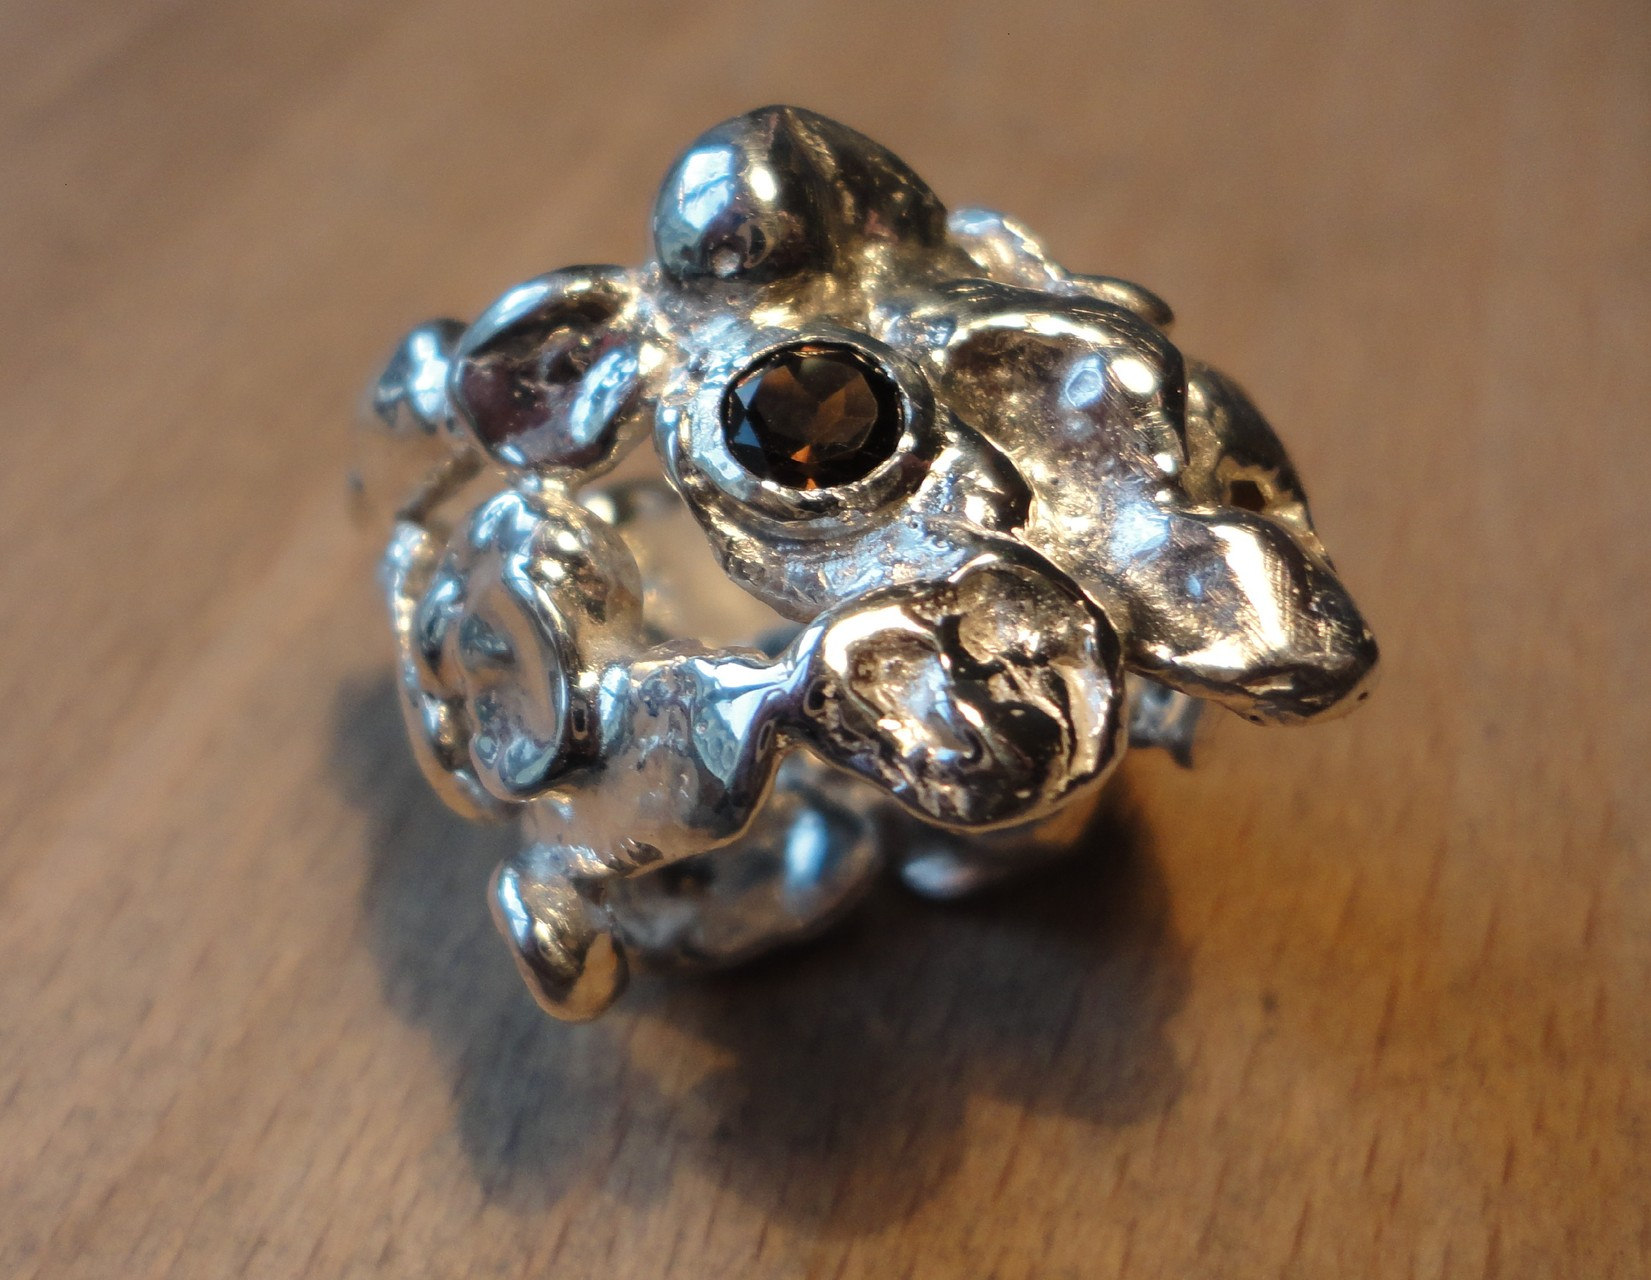 Silber-Nugget Ring mit Rauchquarz (925 Sterlingsilber) Preis: CHF 300.-